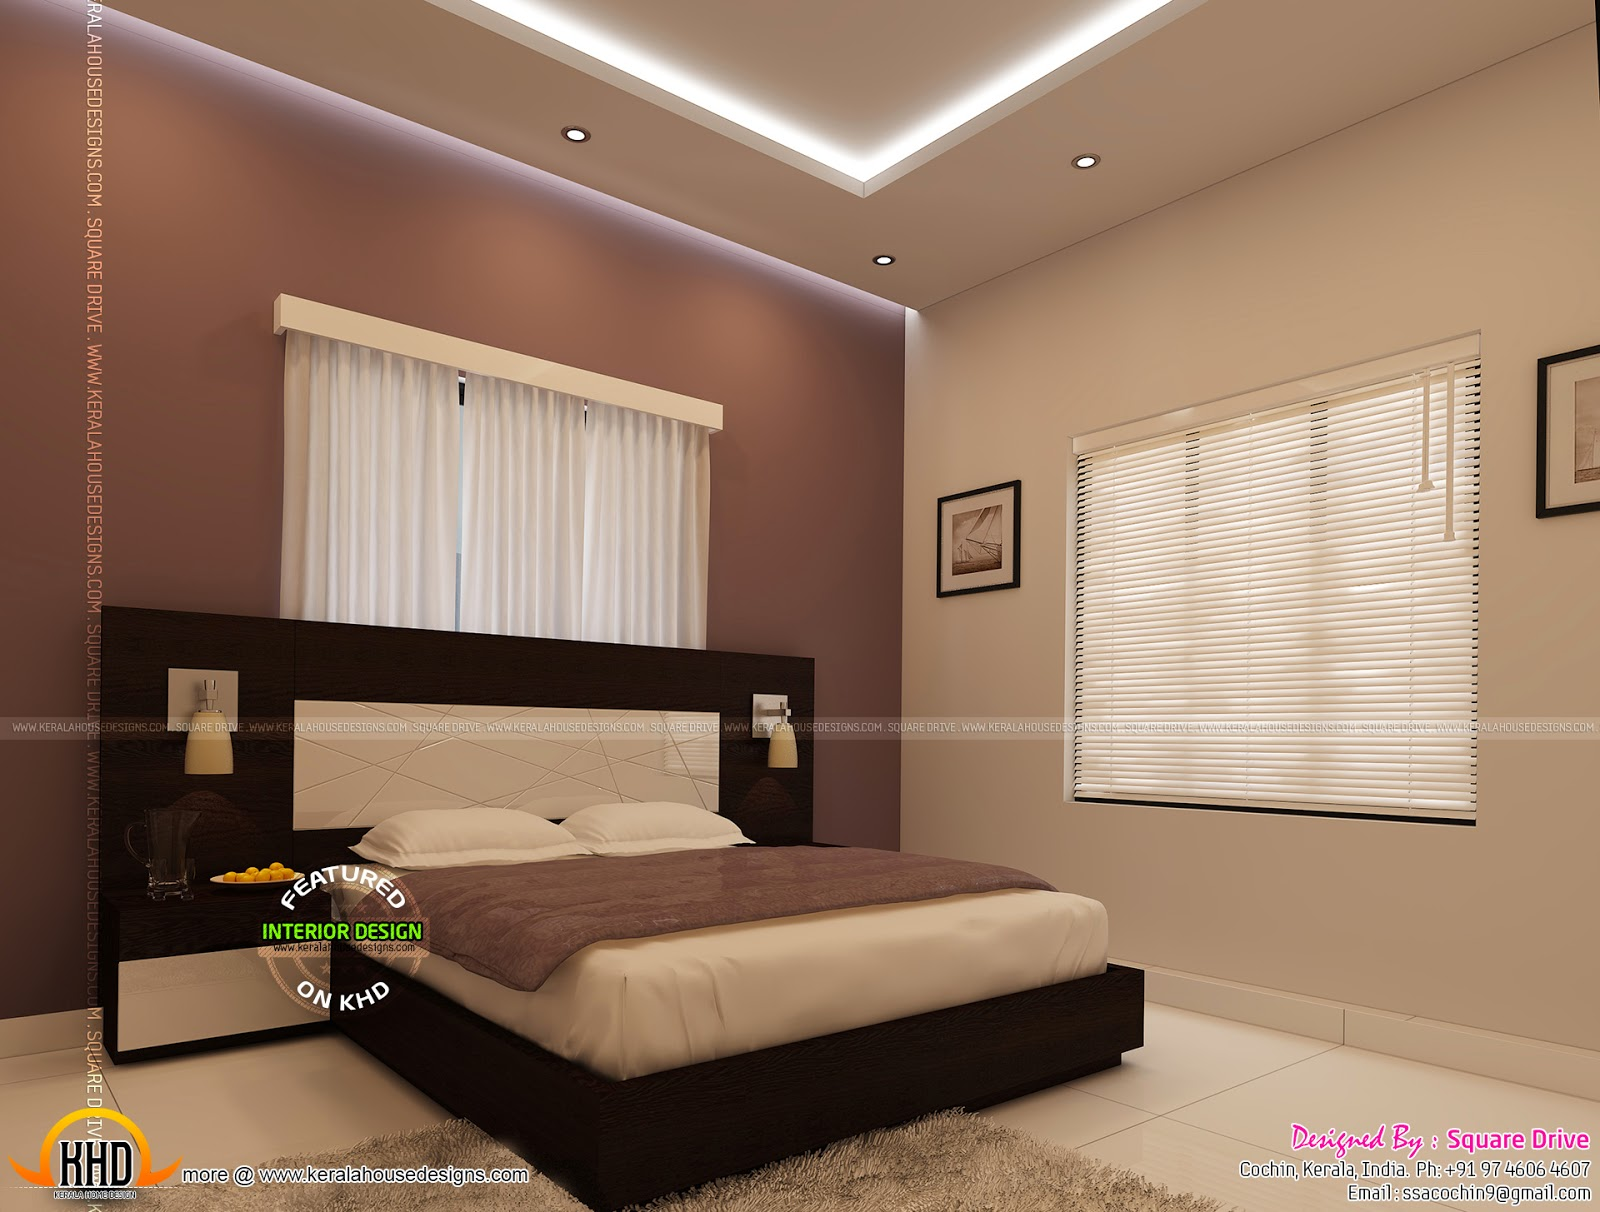 Bedroom interior designs - Kerala home design and floor plans